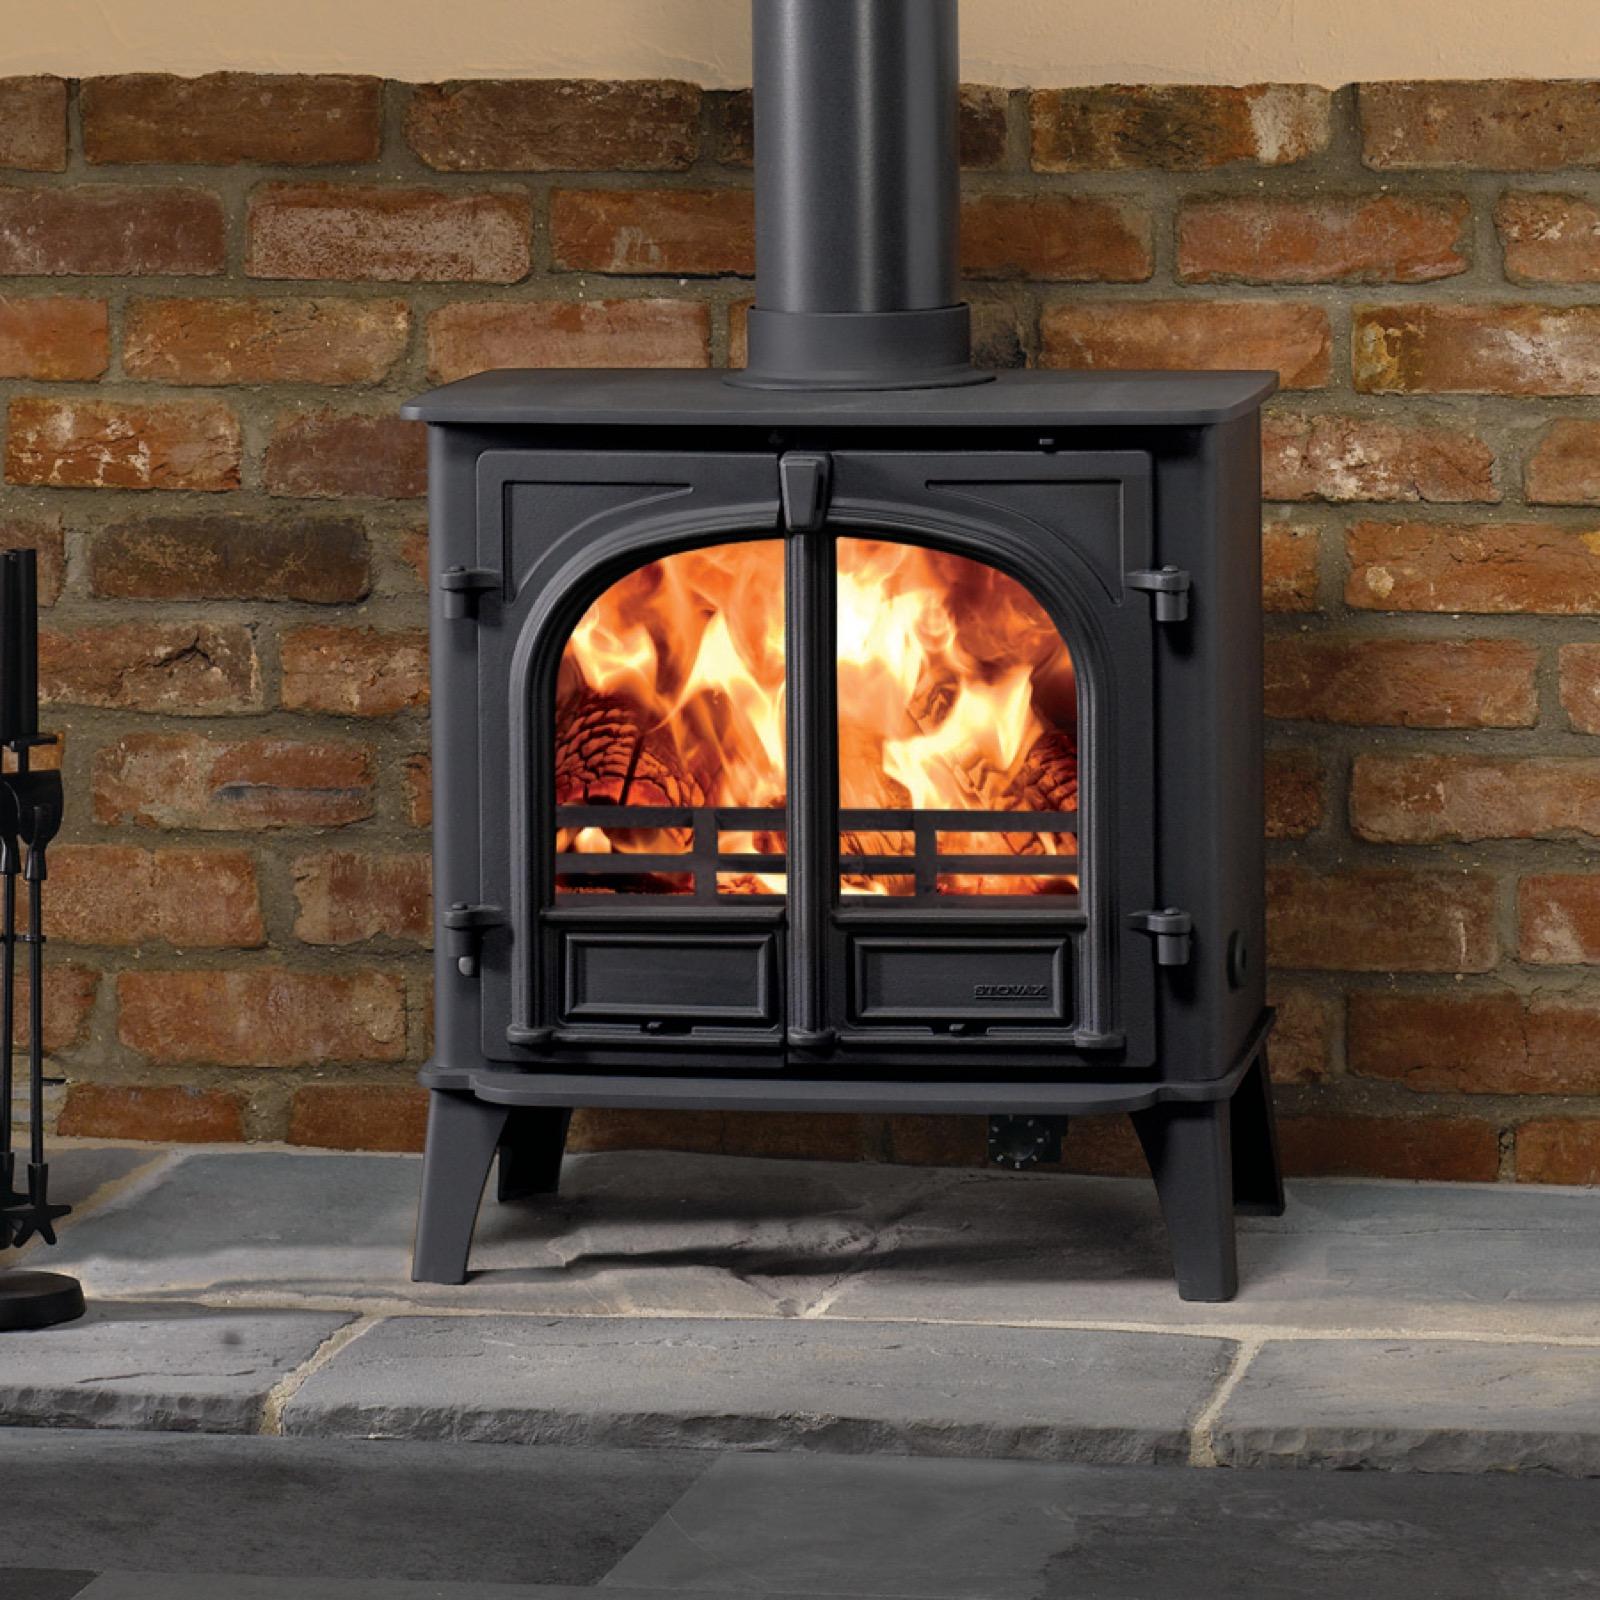 Stovax Stockton 8hb Multifuel Boiler Stove Simply Stoves